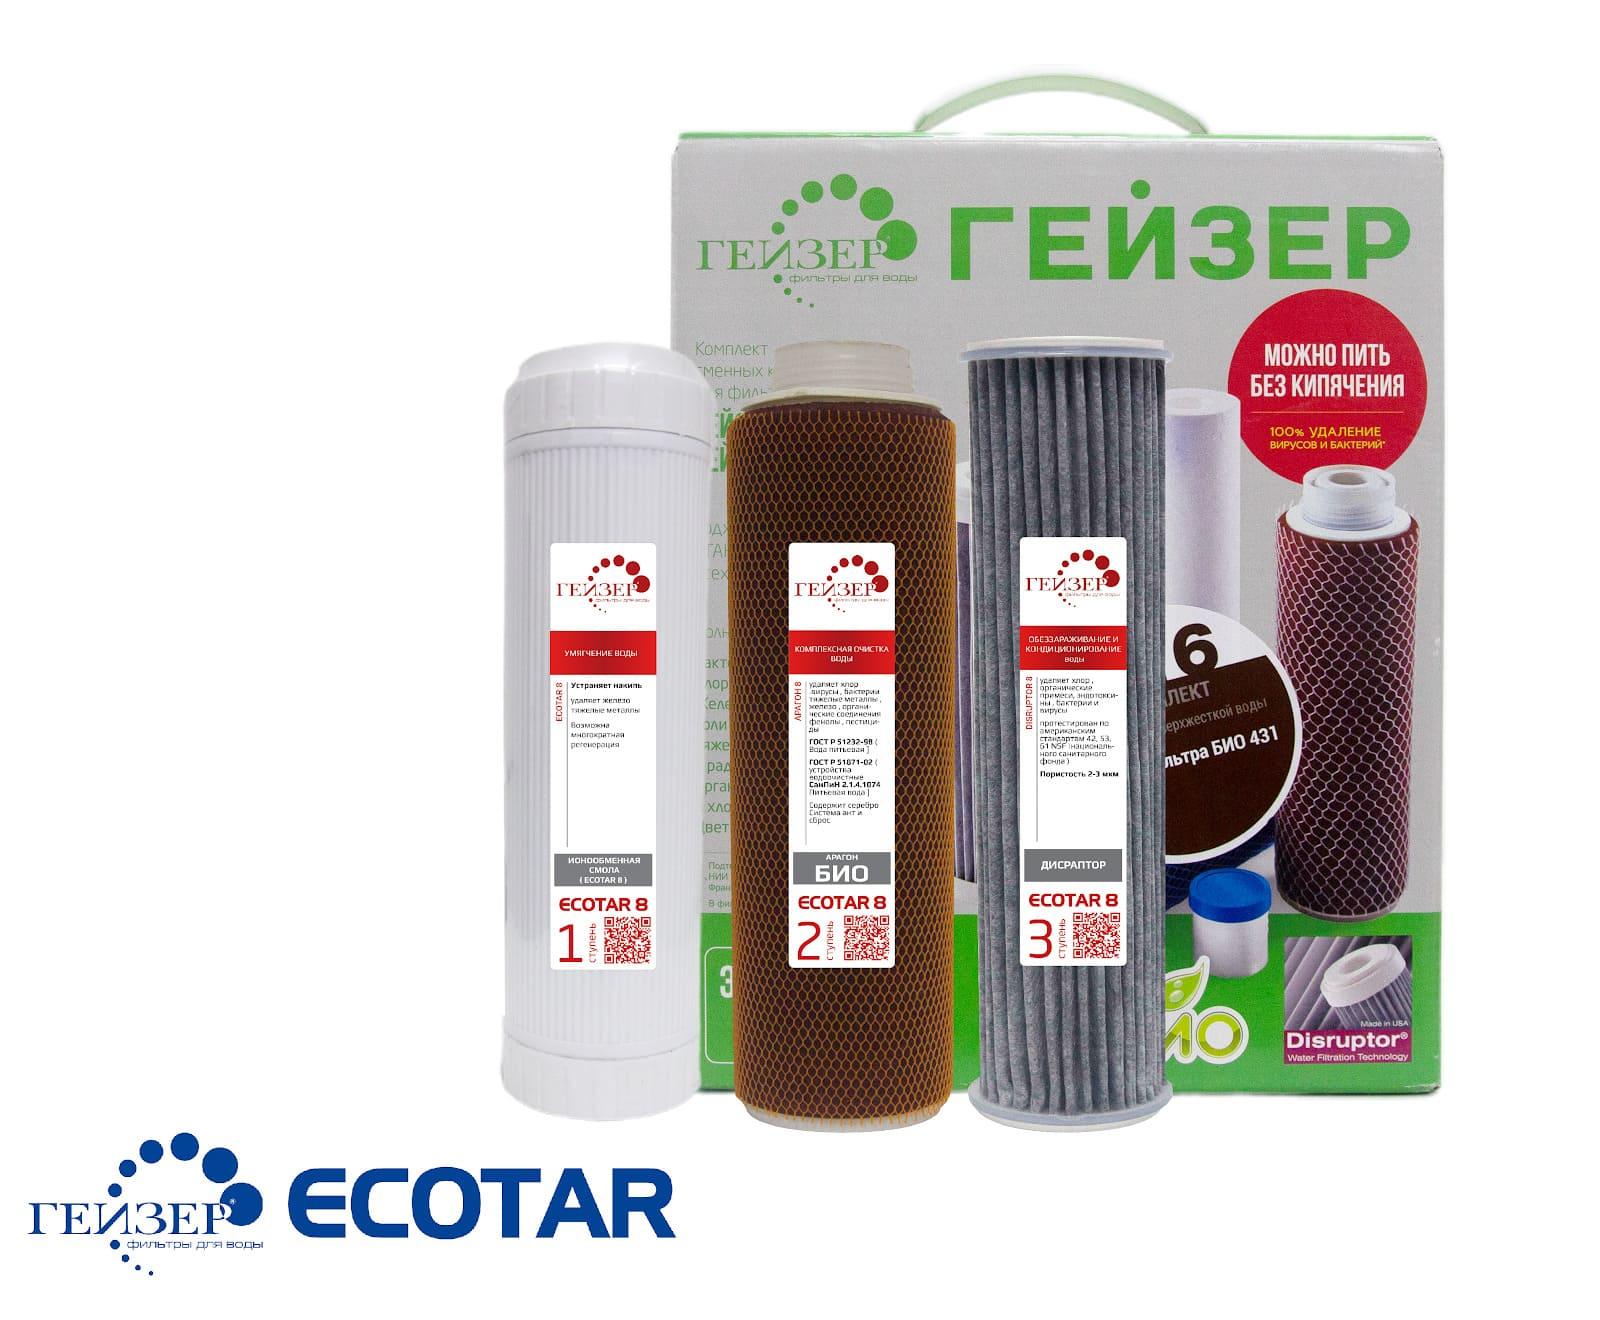 Bộ lõi lọc UniTECH máy lọc nước Ion canxi Geyser Ecotar 8